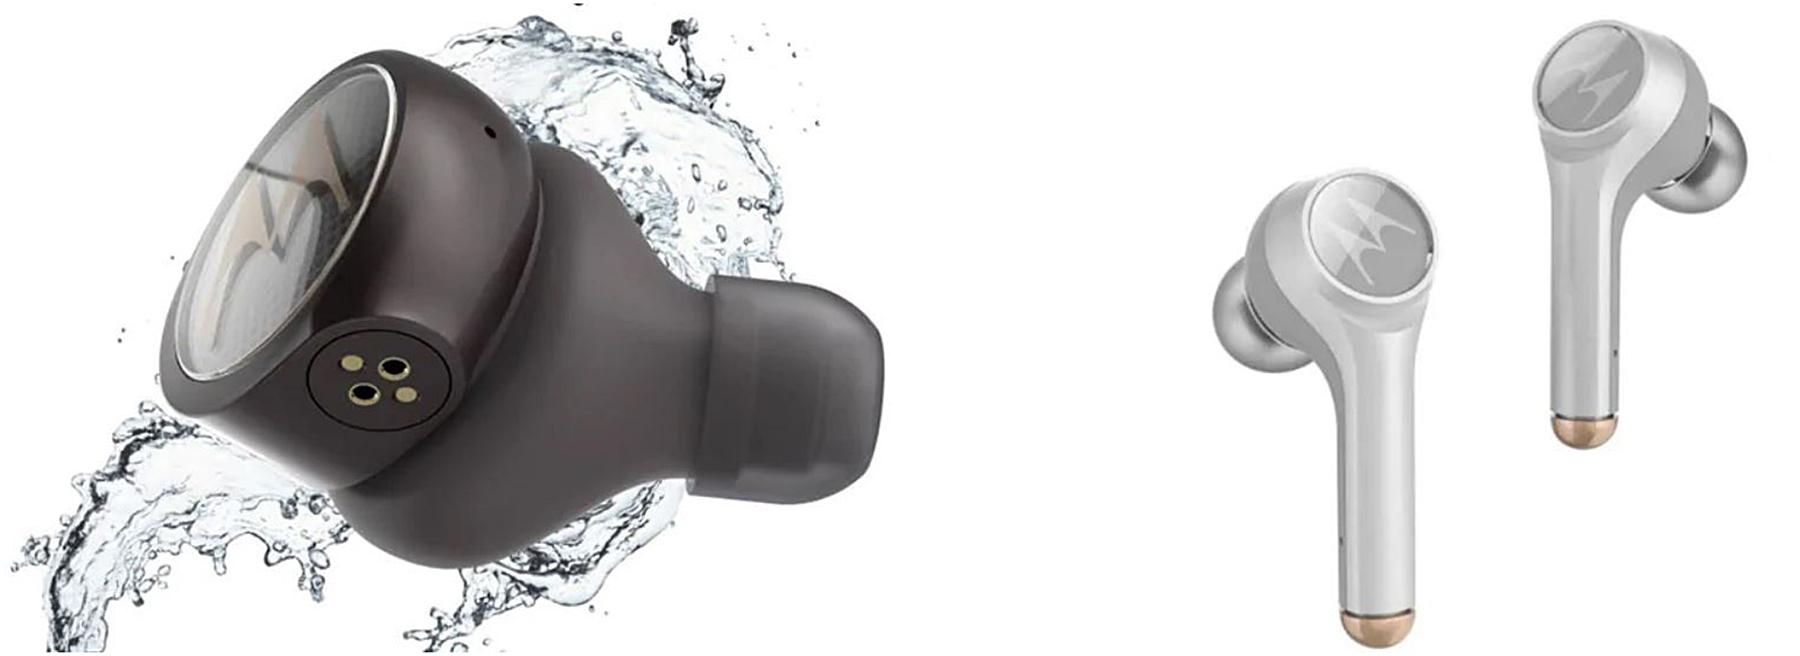 tinhte-ifa19-motorola-product-1.jpg